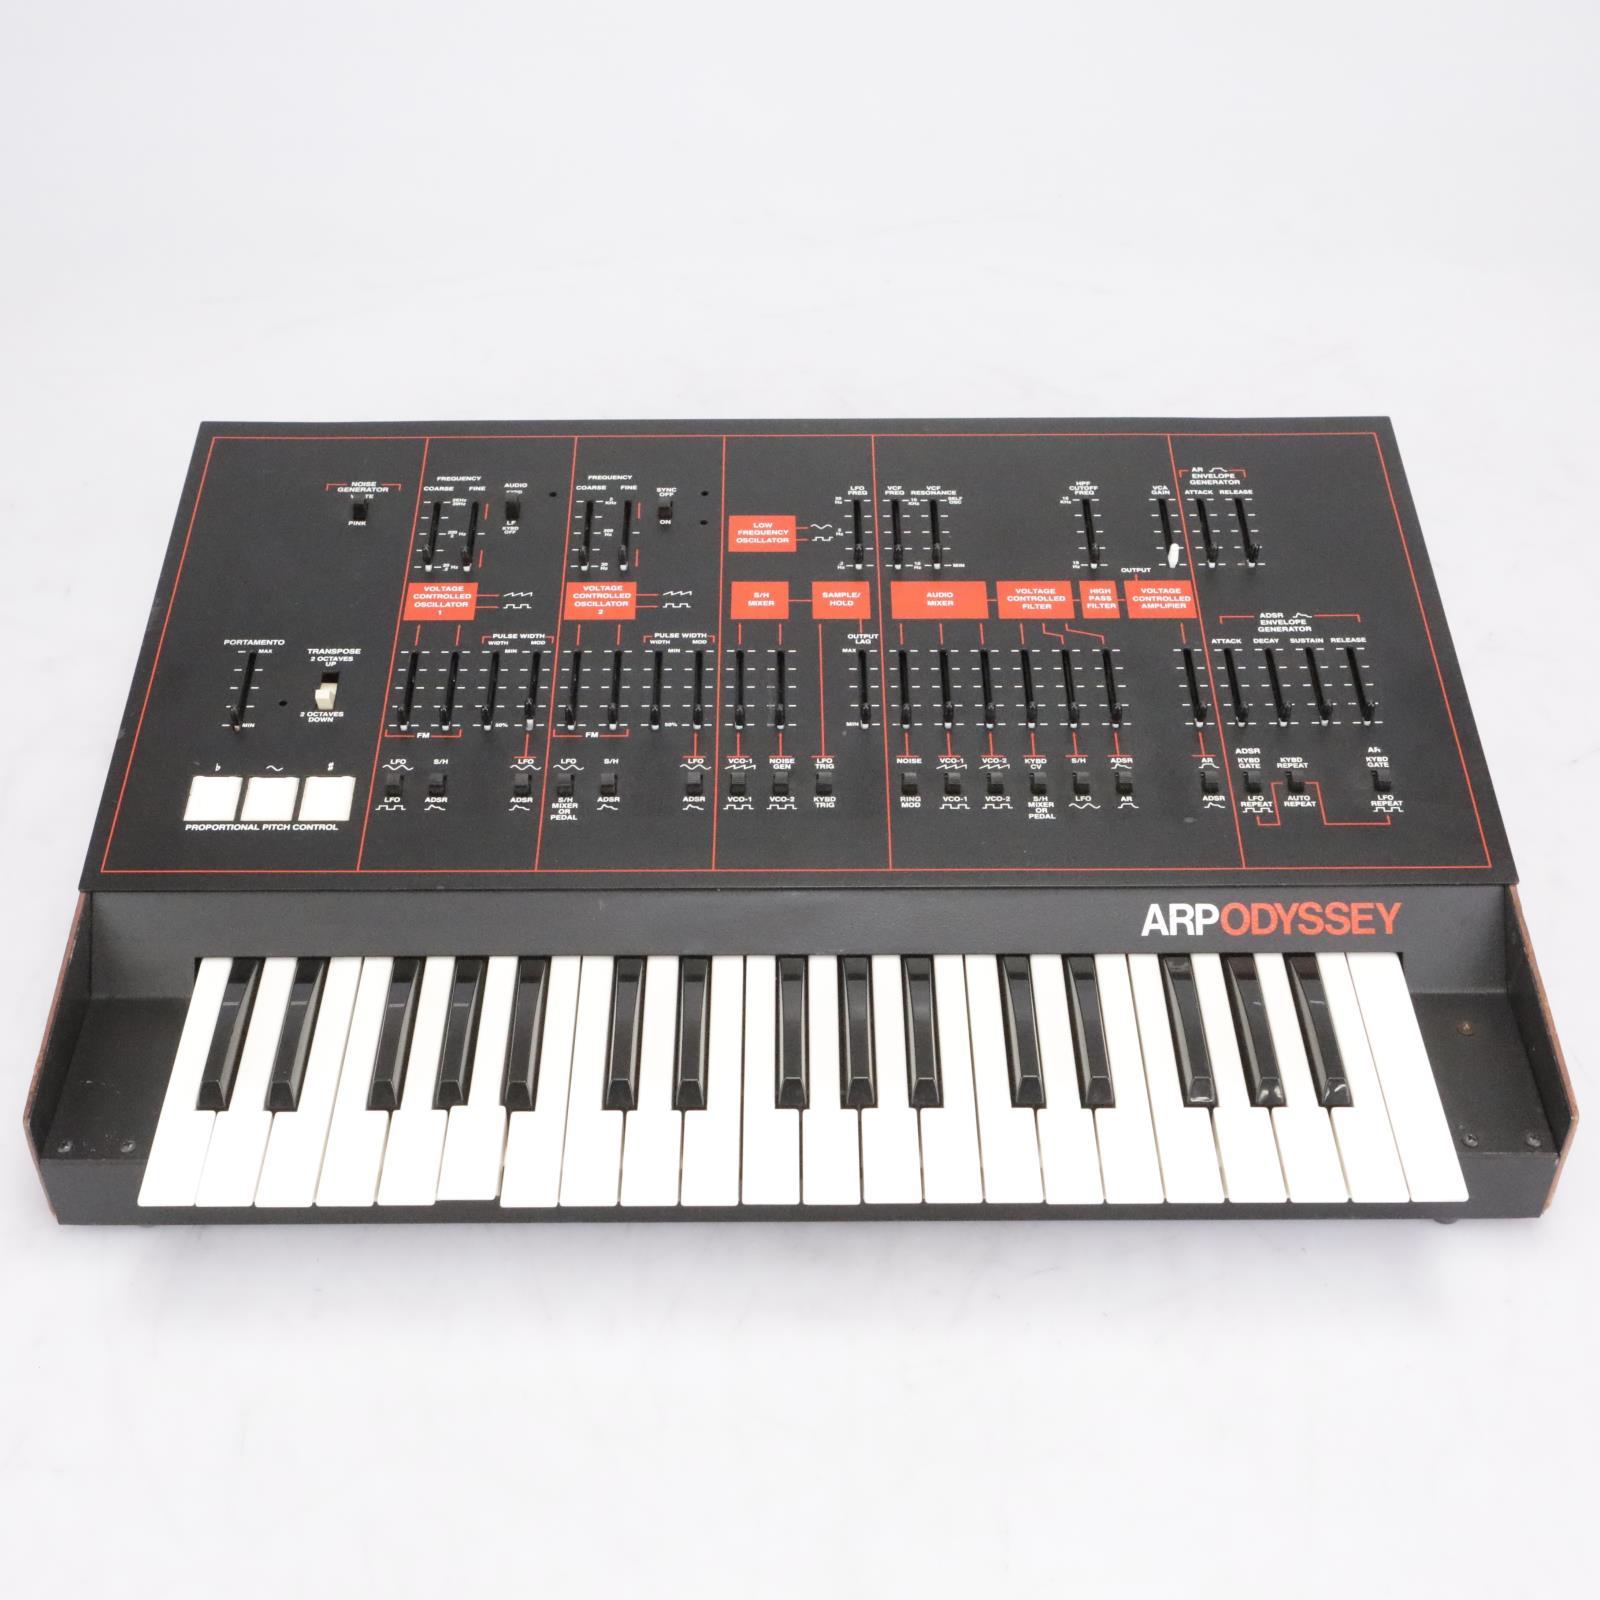 Vintage ARP Odyssey Model 2823 MKIII Analog Synthesizer Keyboard #42673